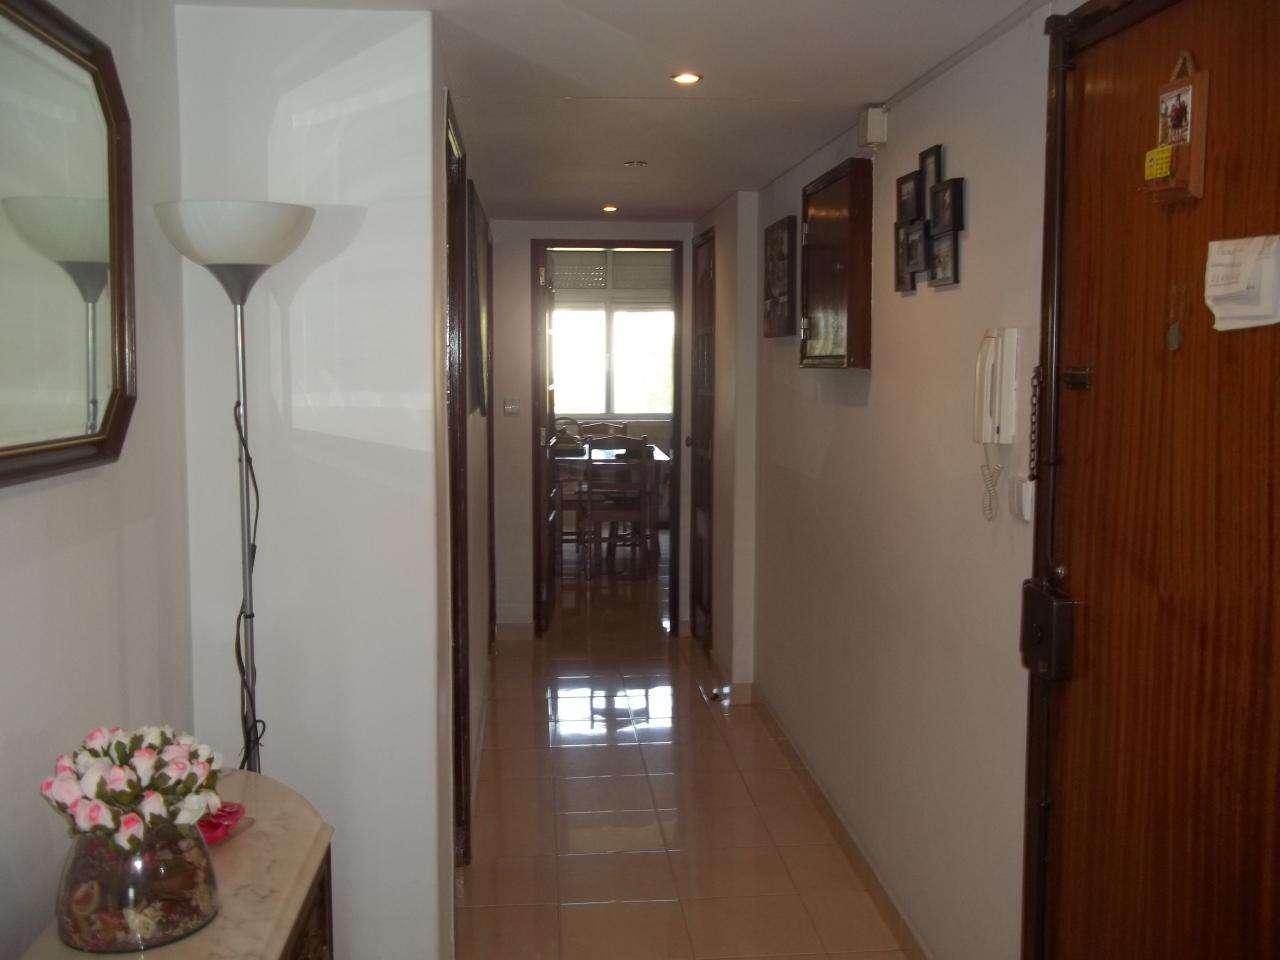 Apartamento para comprar, Rio de Mouro, Lisboa - Foto 3